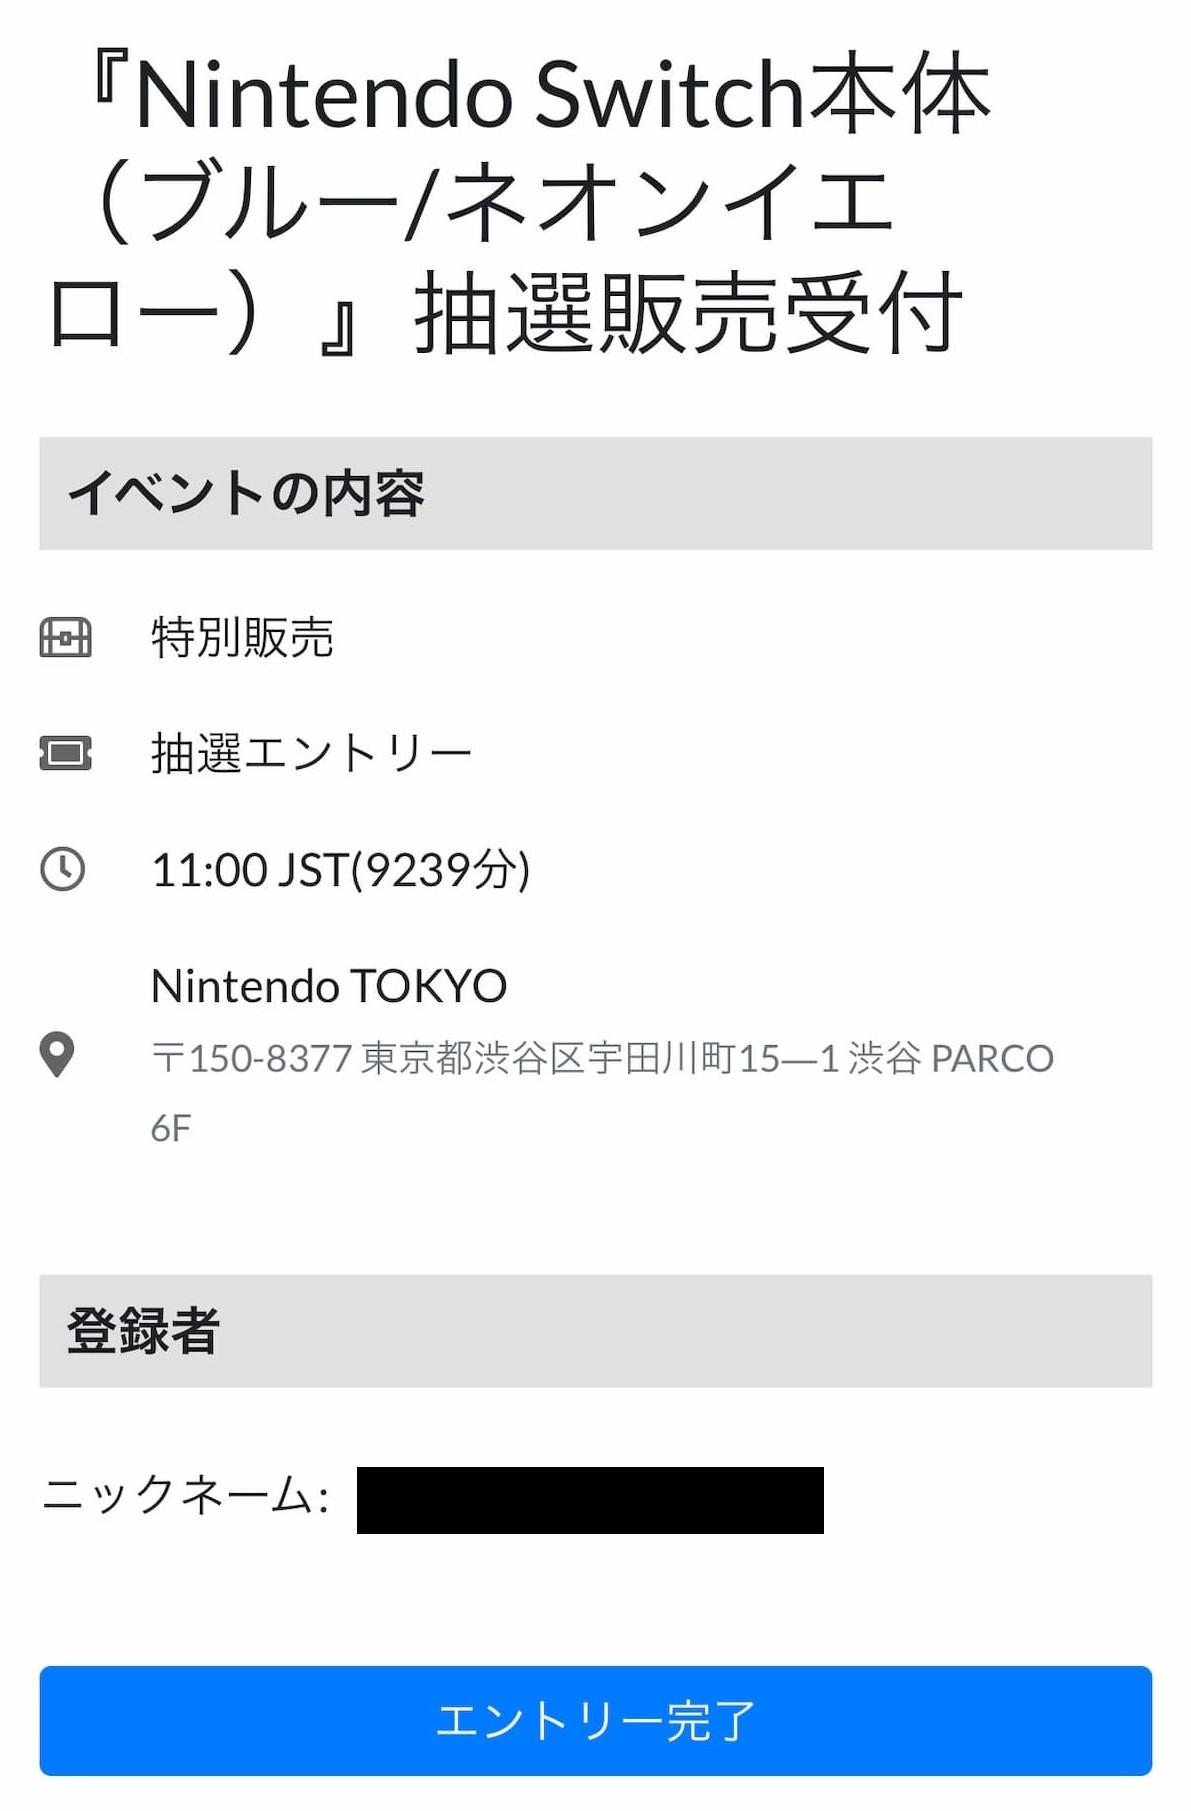 Nintendo TOKYO抽選販売申込手順